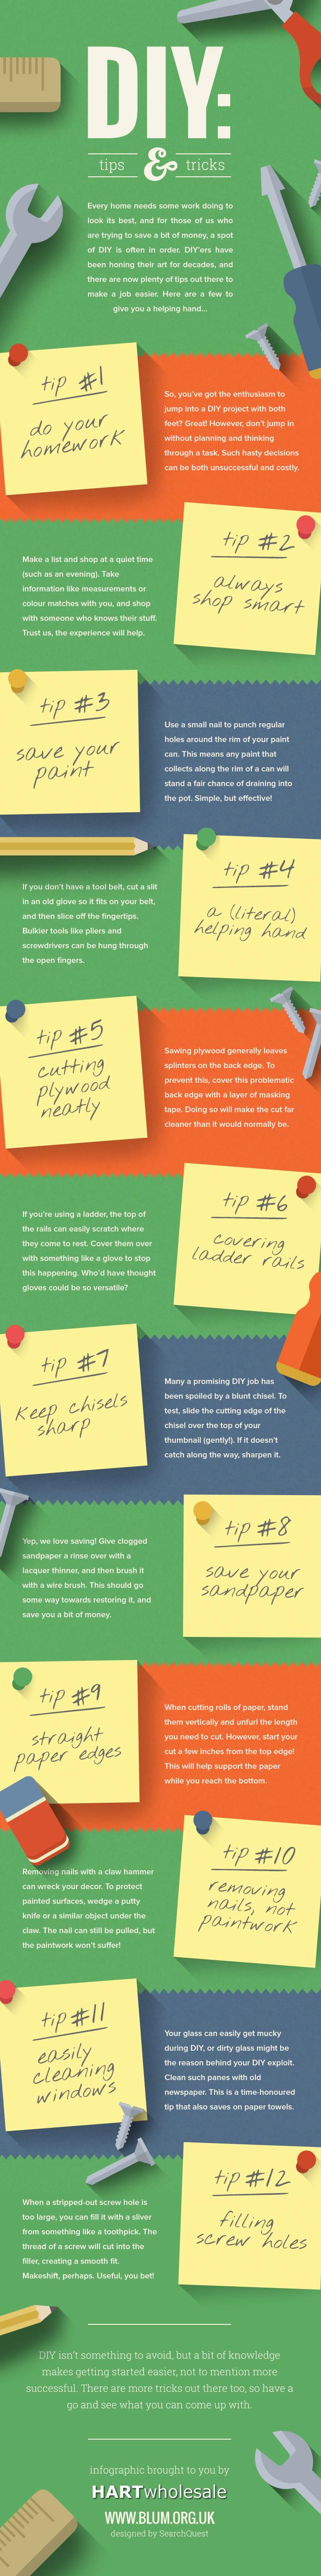 DIY: Tips & Tricks [Infographic]